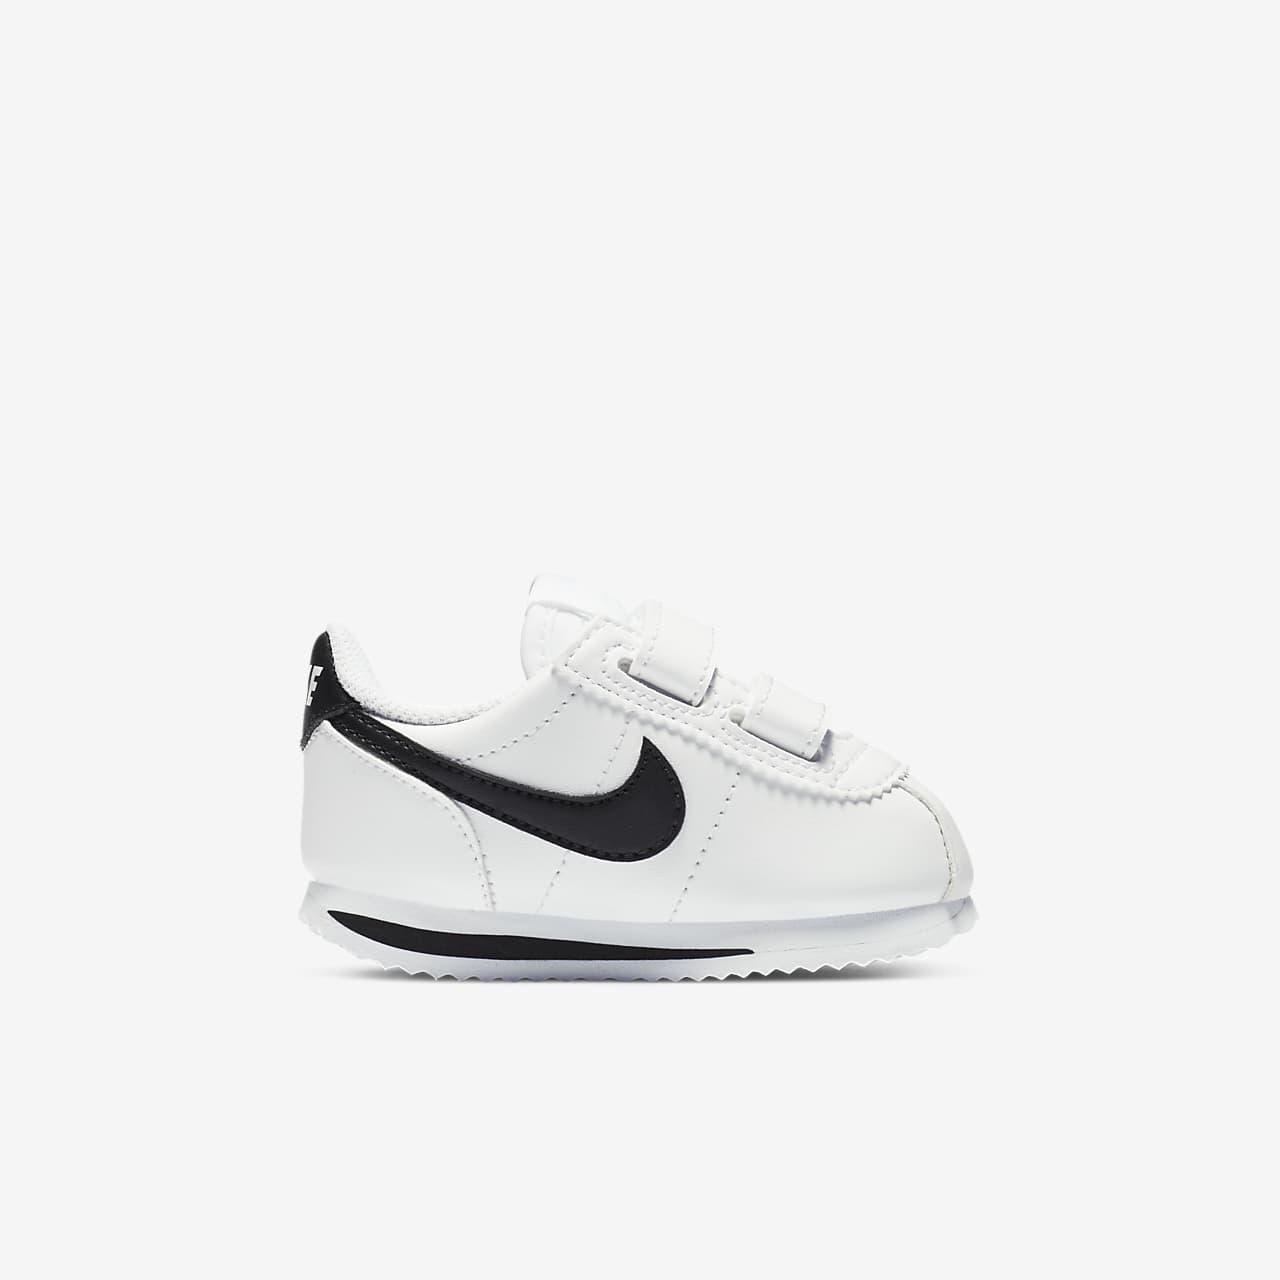 5ffe1cdef8a54 Nike Cortez Basic SL Baby & Toddler Shoe. Nike.com ID